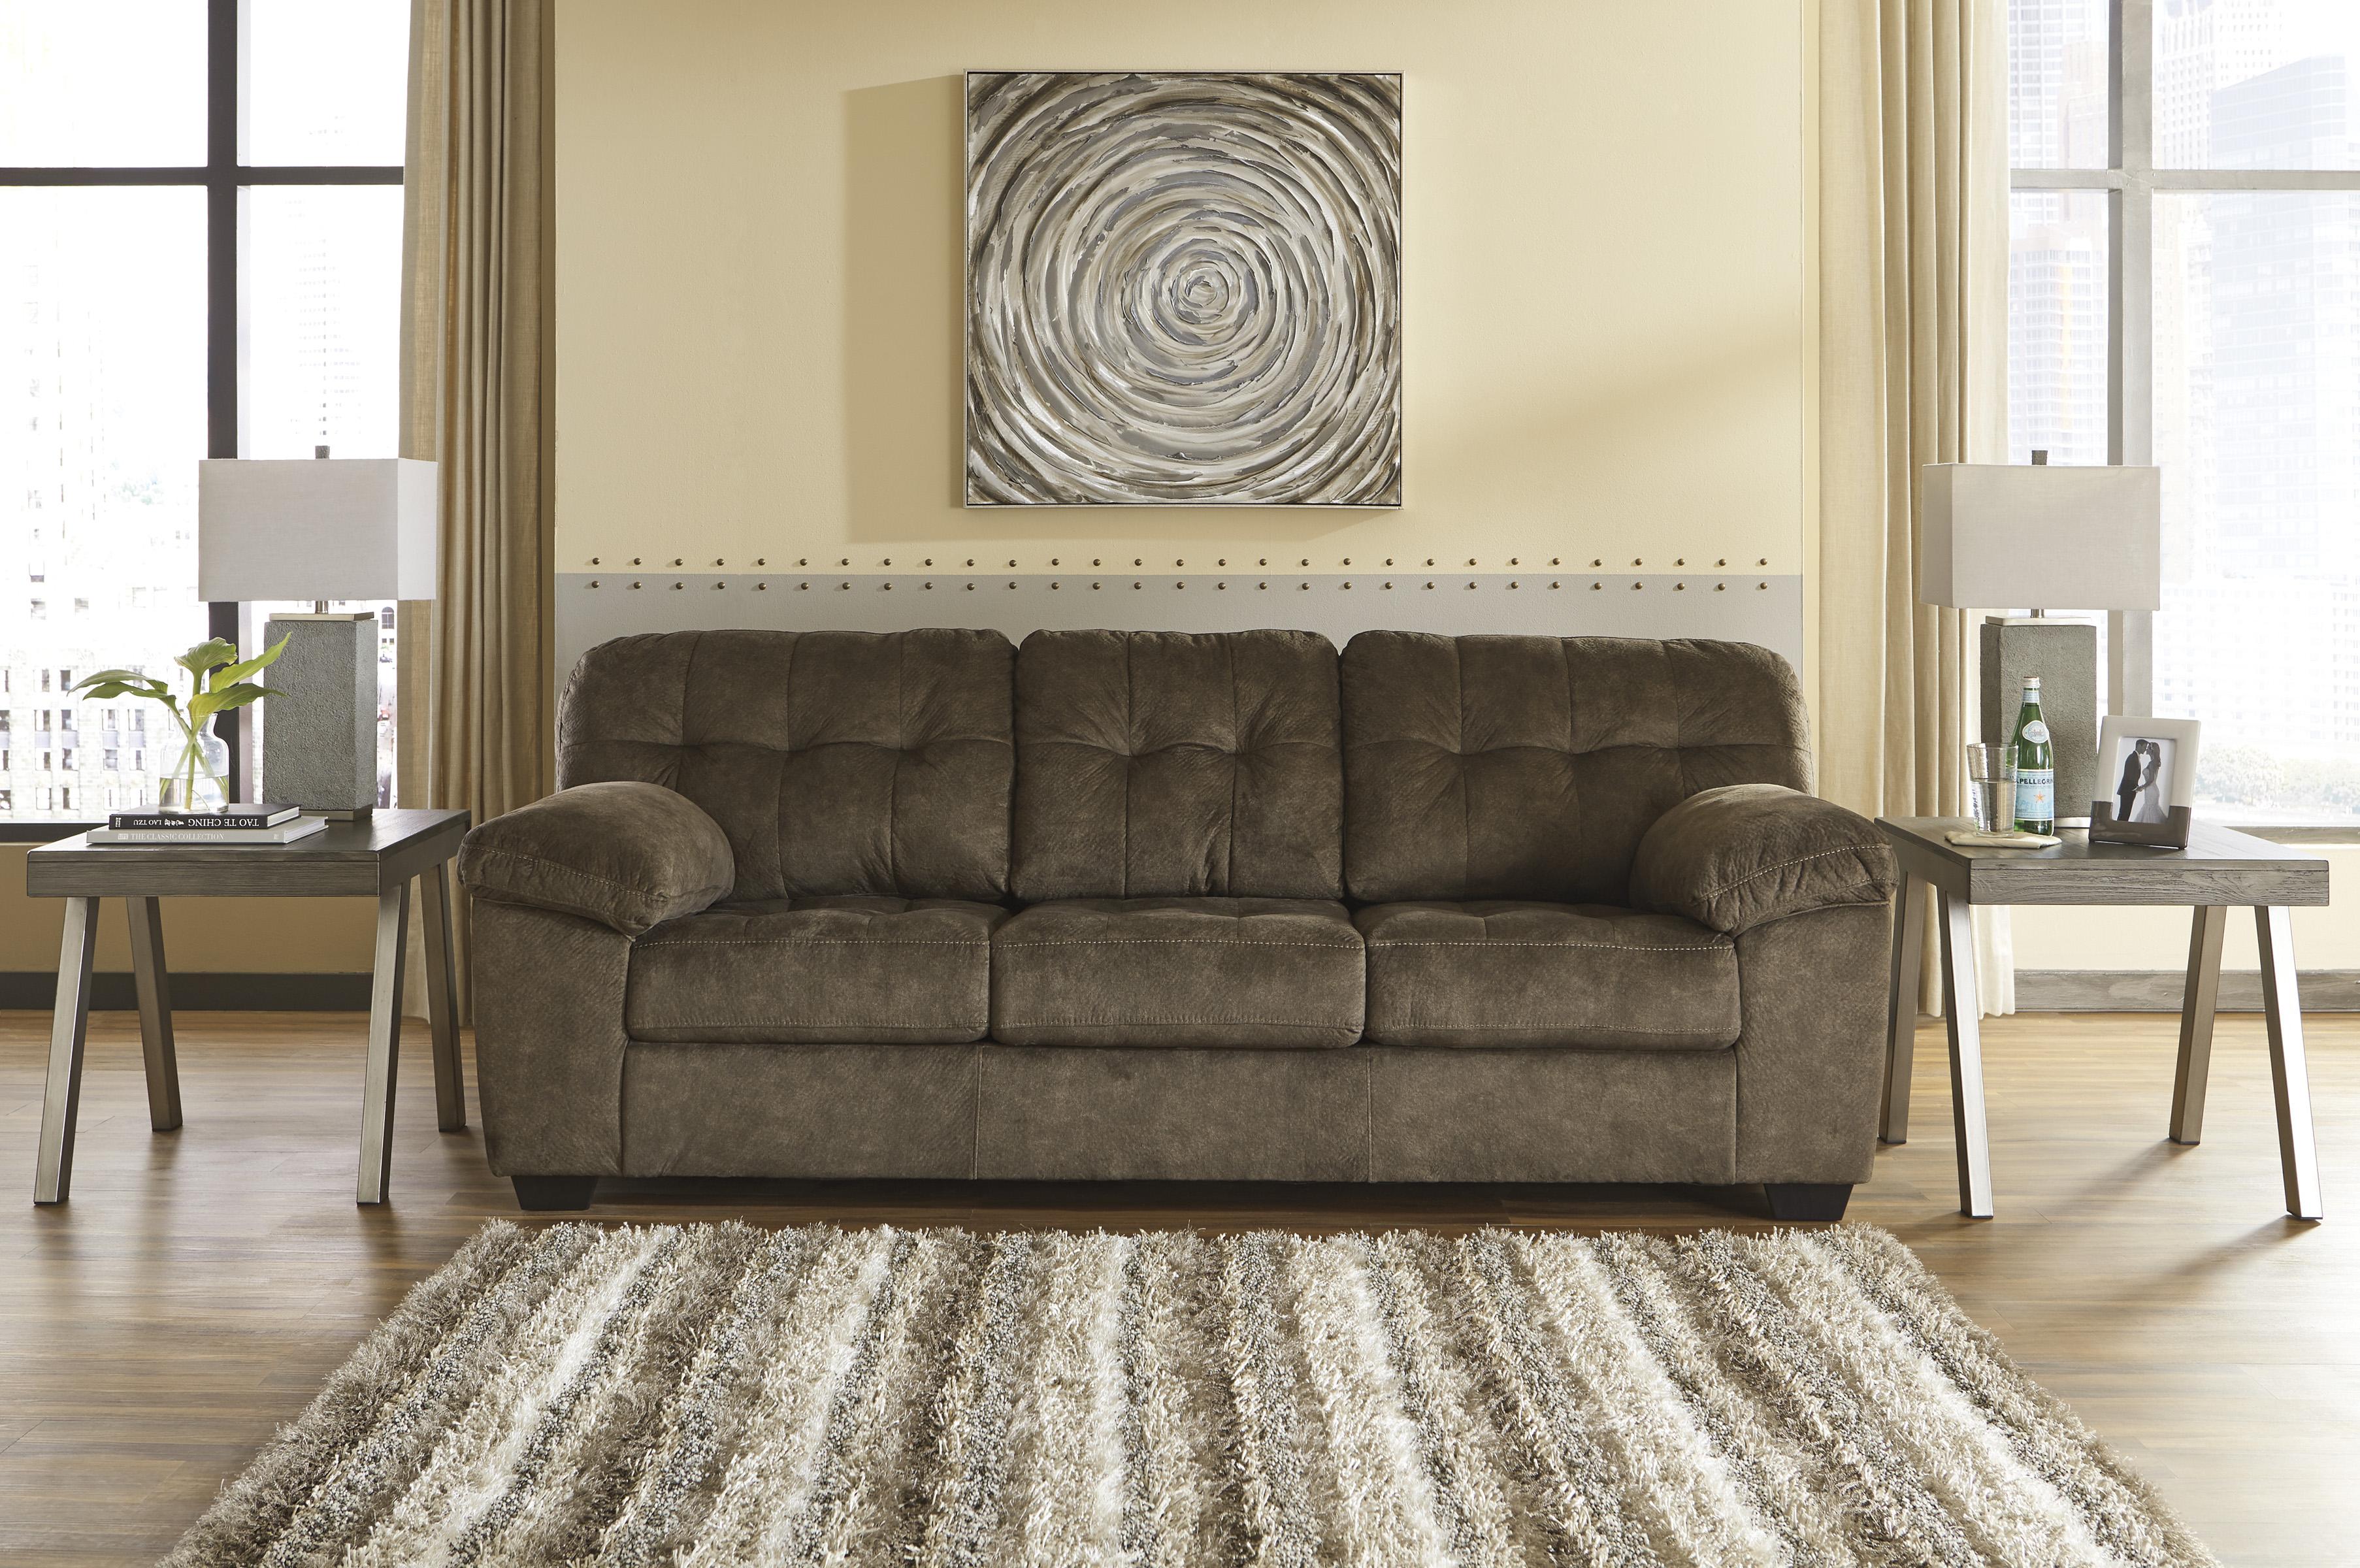 Accrington Earth Queen Sofa Sleeper Easy To Lift Mechanism